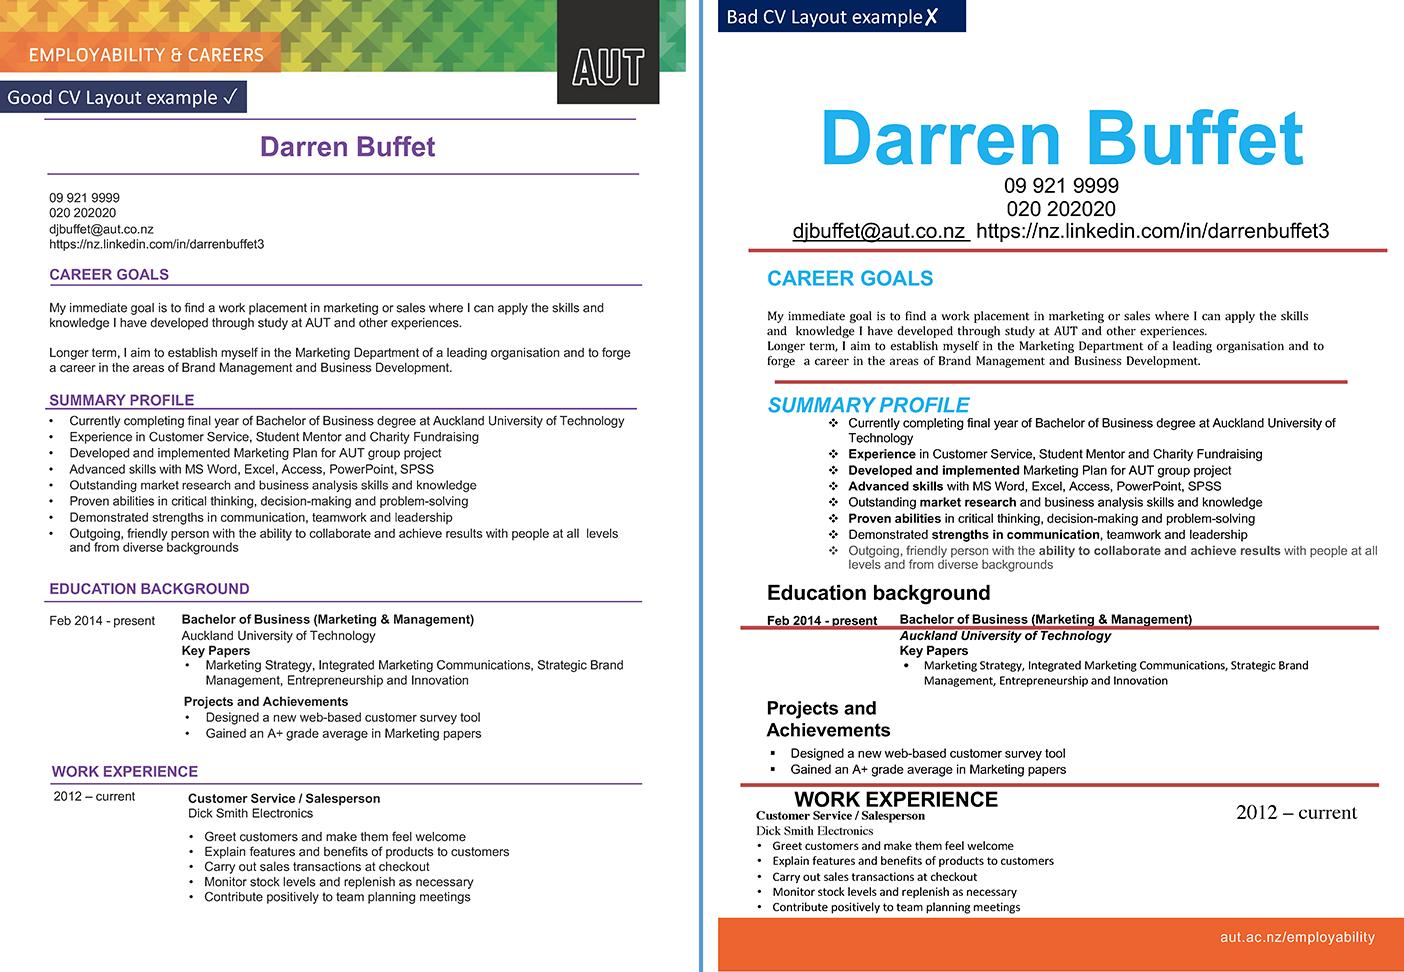 CV comparison good and bad